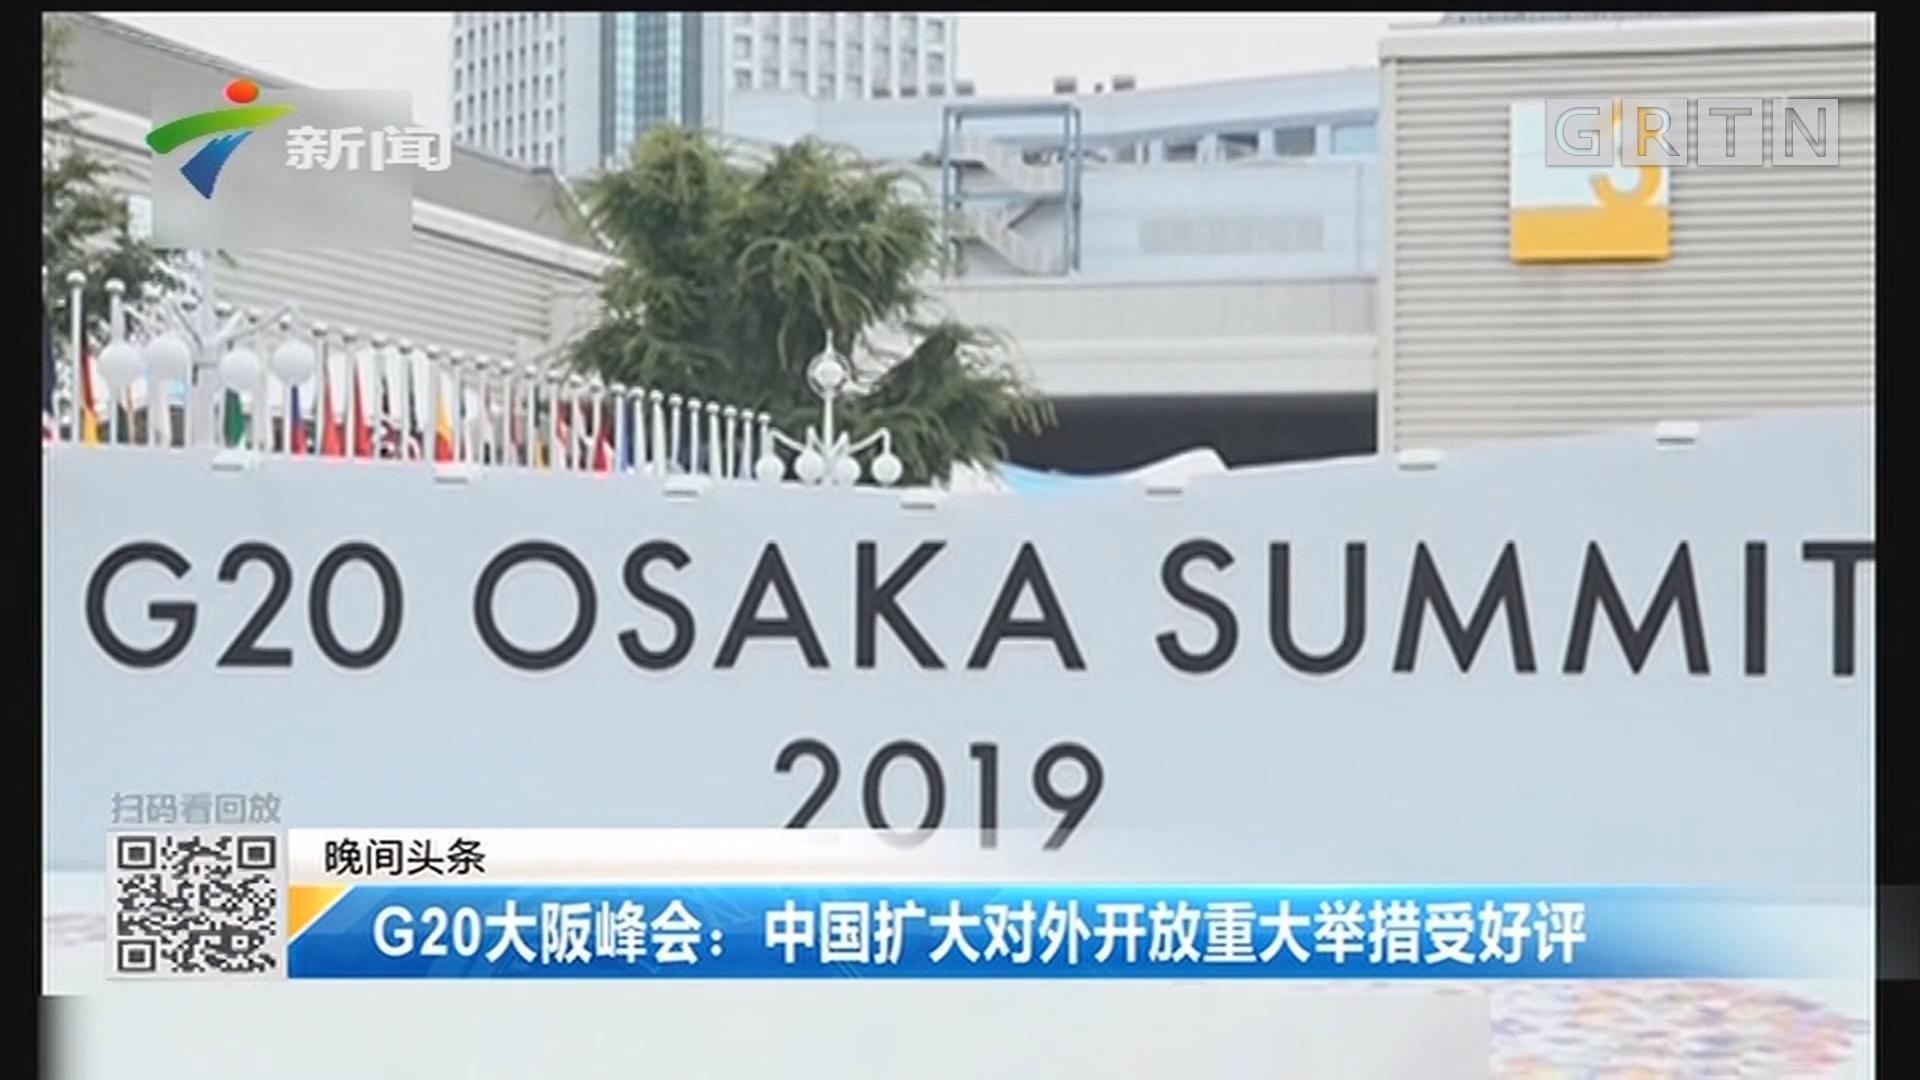 G20大阪峰会:中国扩大对外开放重大举措受好评